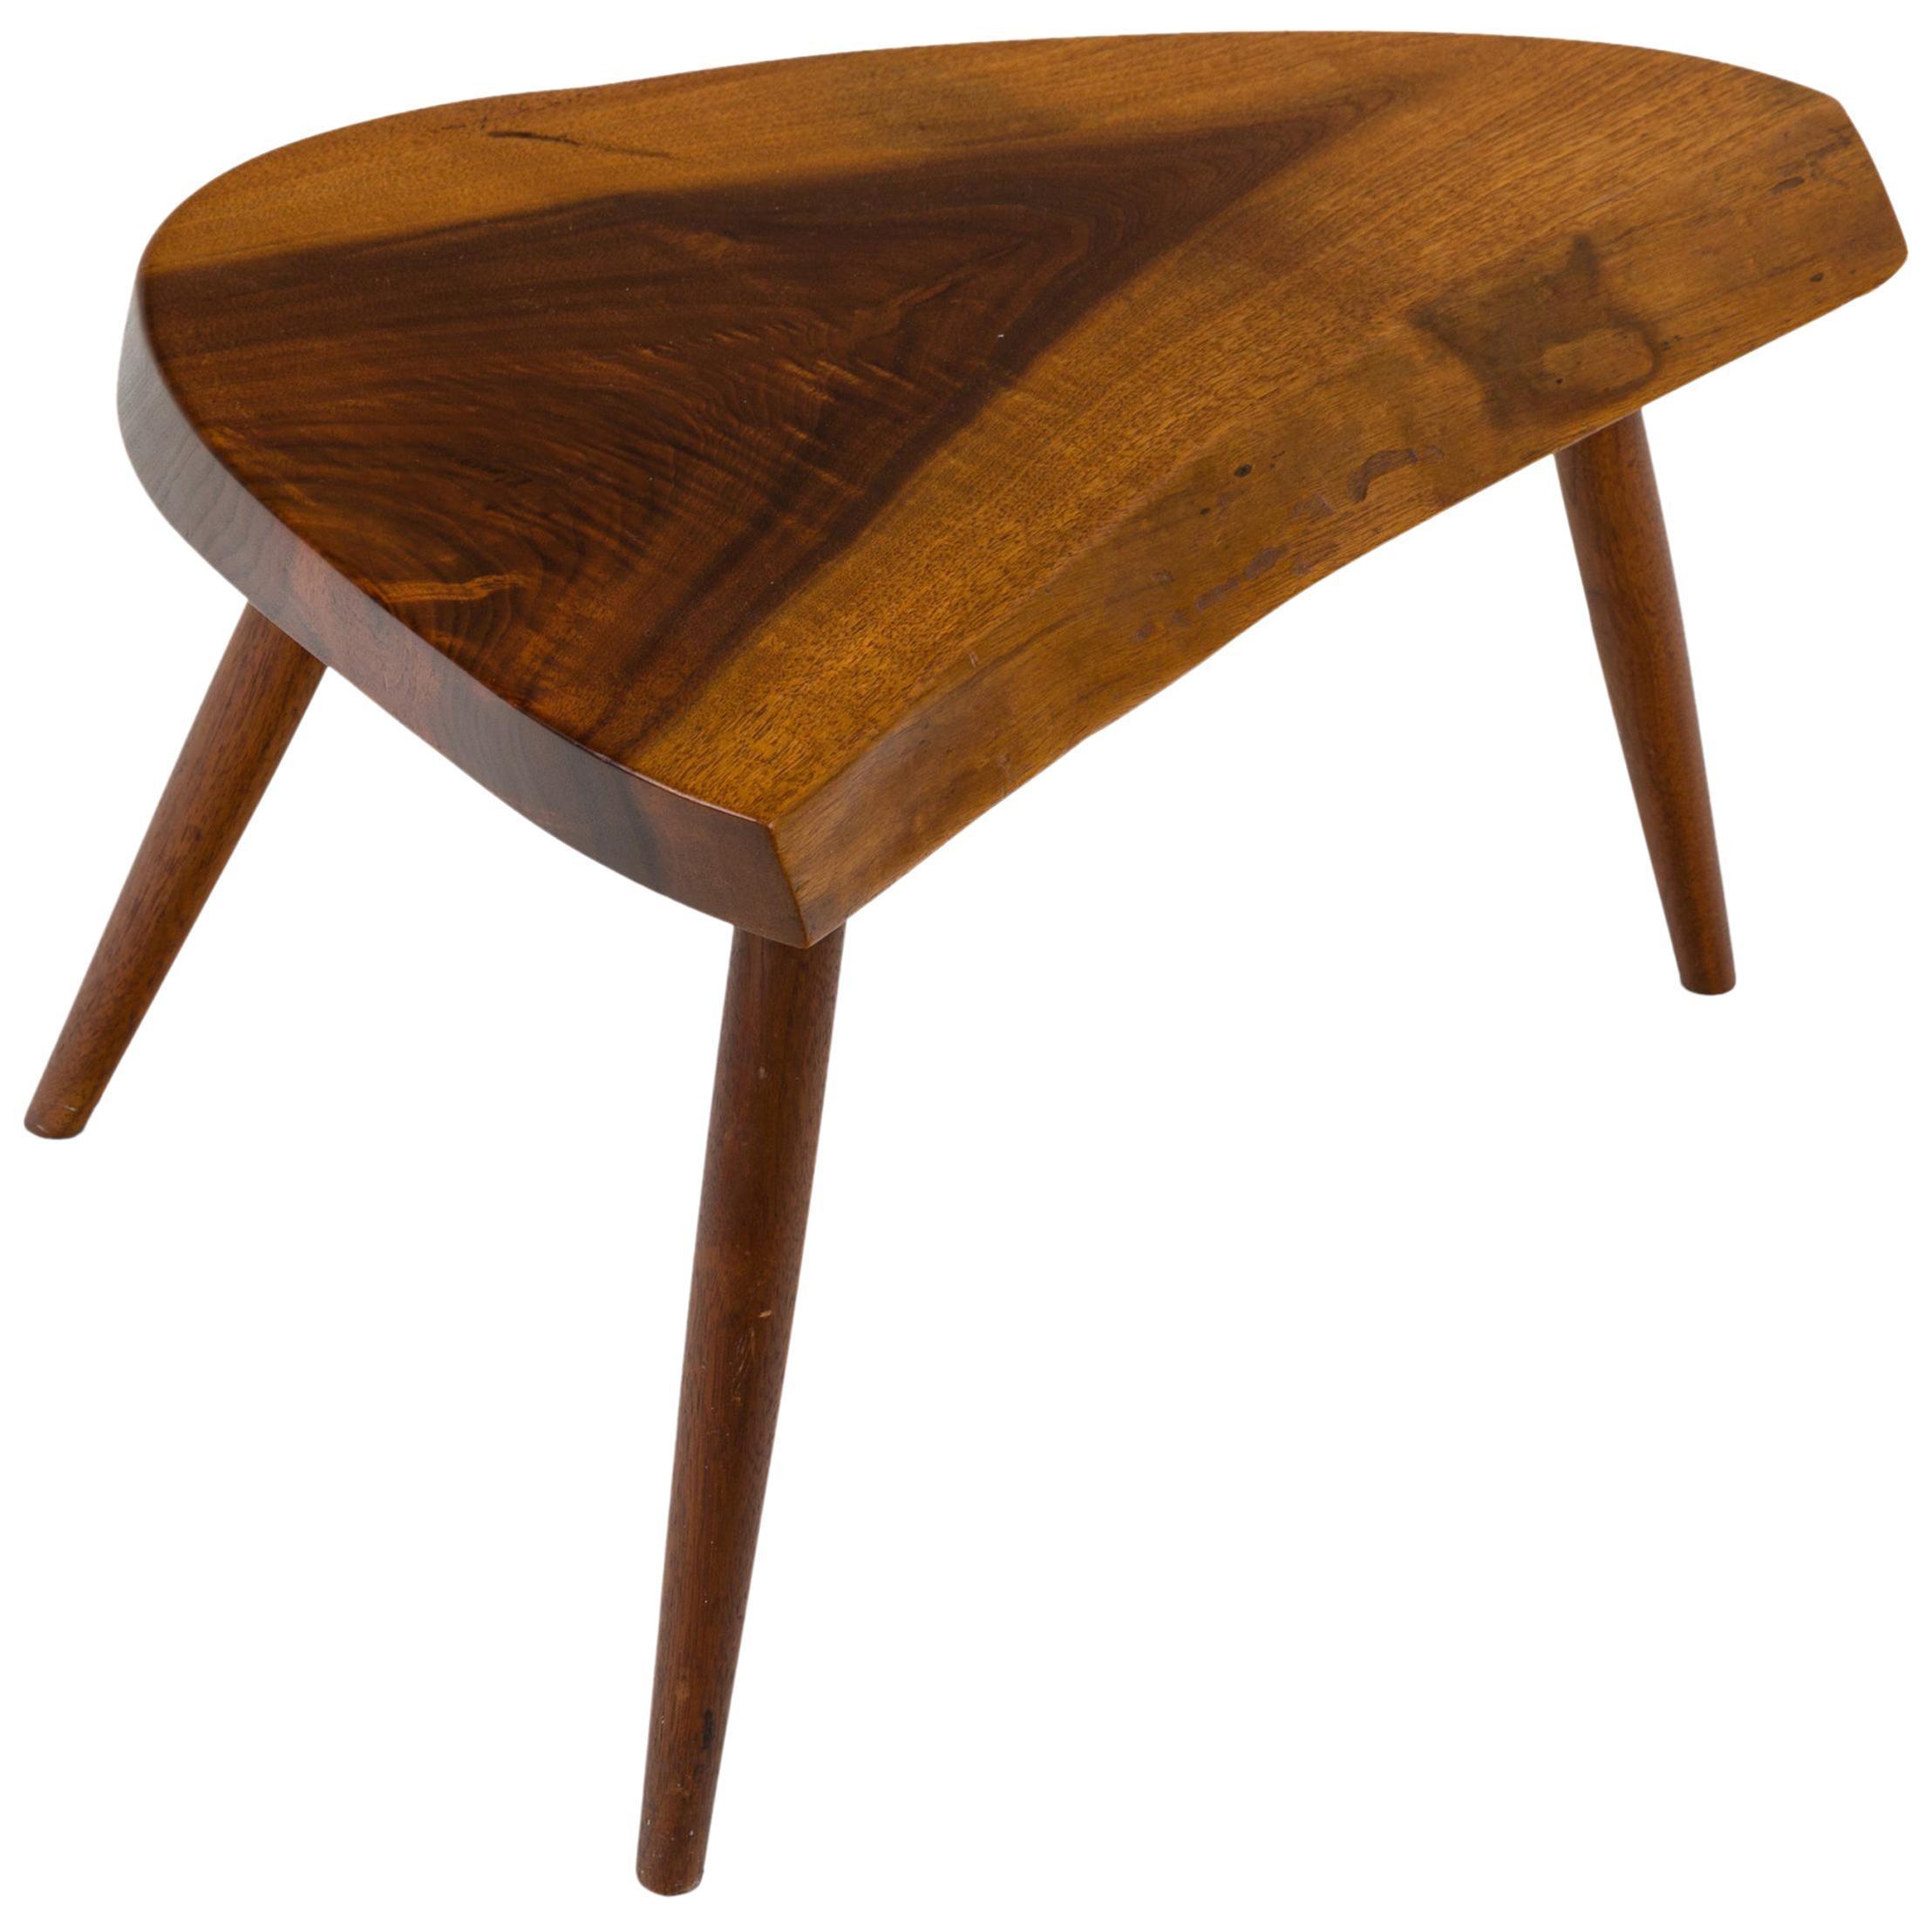 George Nakashima Wepman Walnut Occasional Table, USA, 1960s